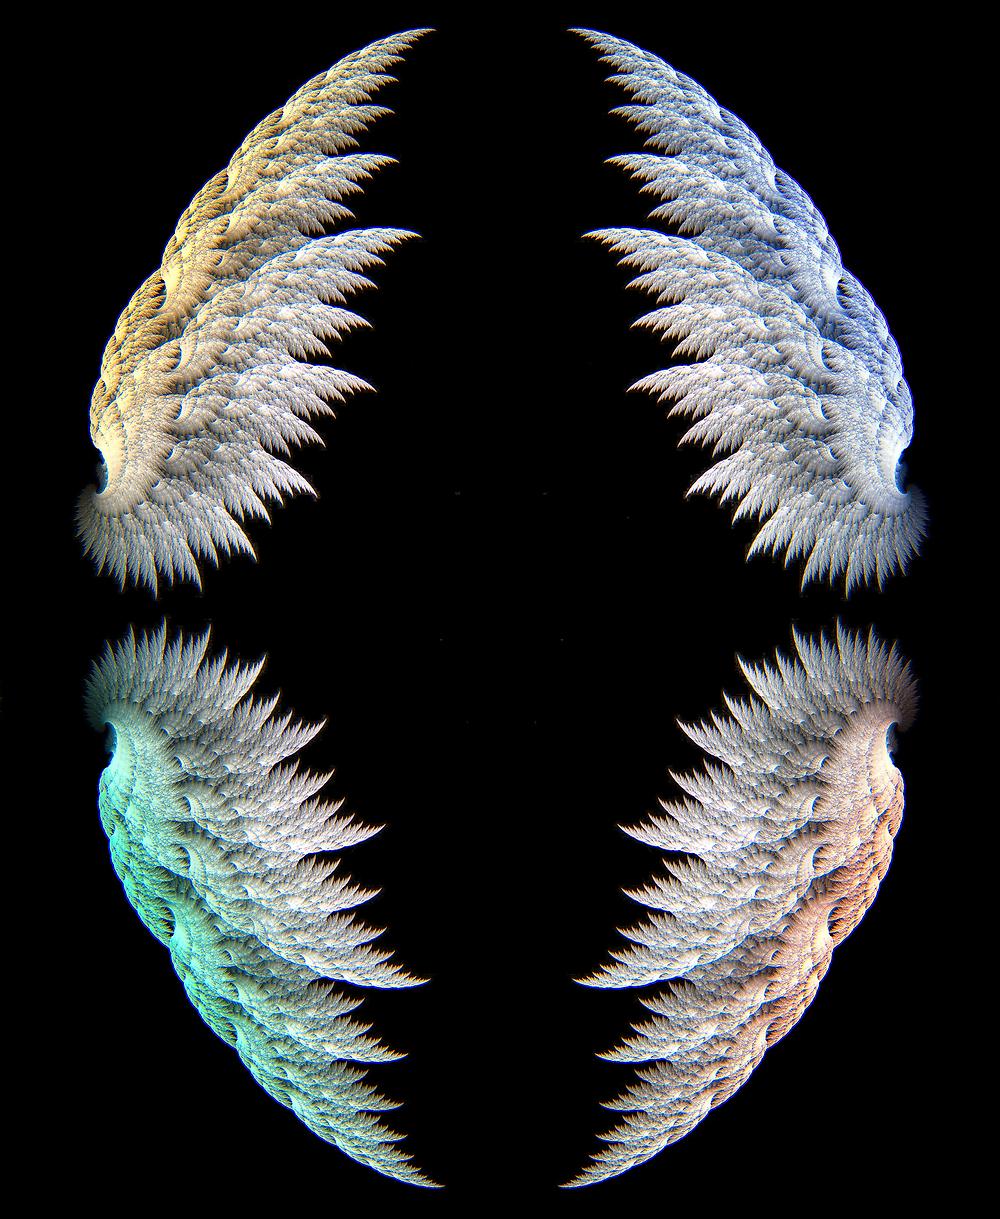 Wings Guard Soul, Anonymous Limbs Media, YCN JSN 1.png